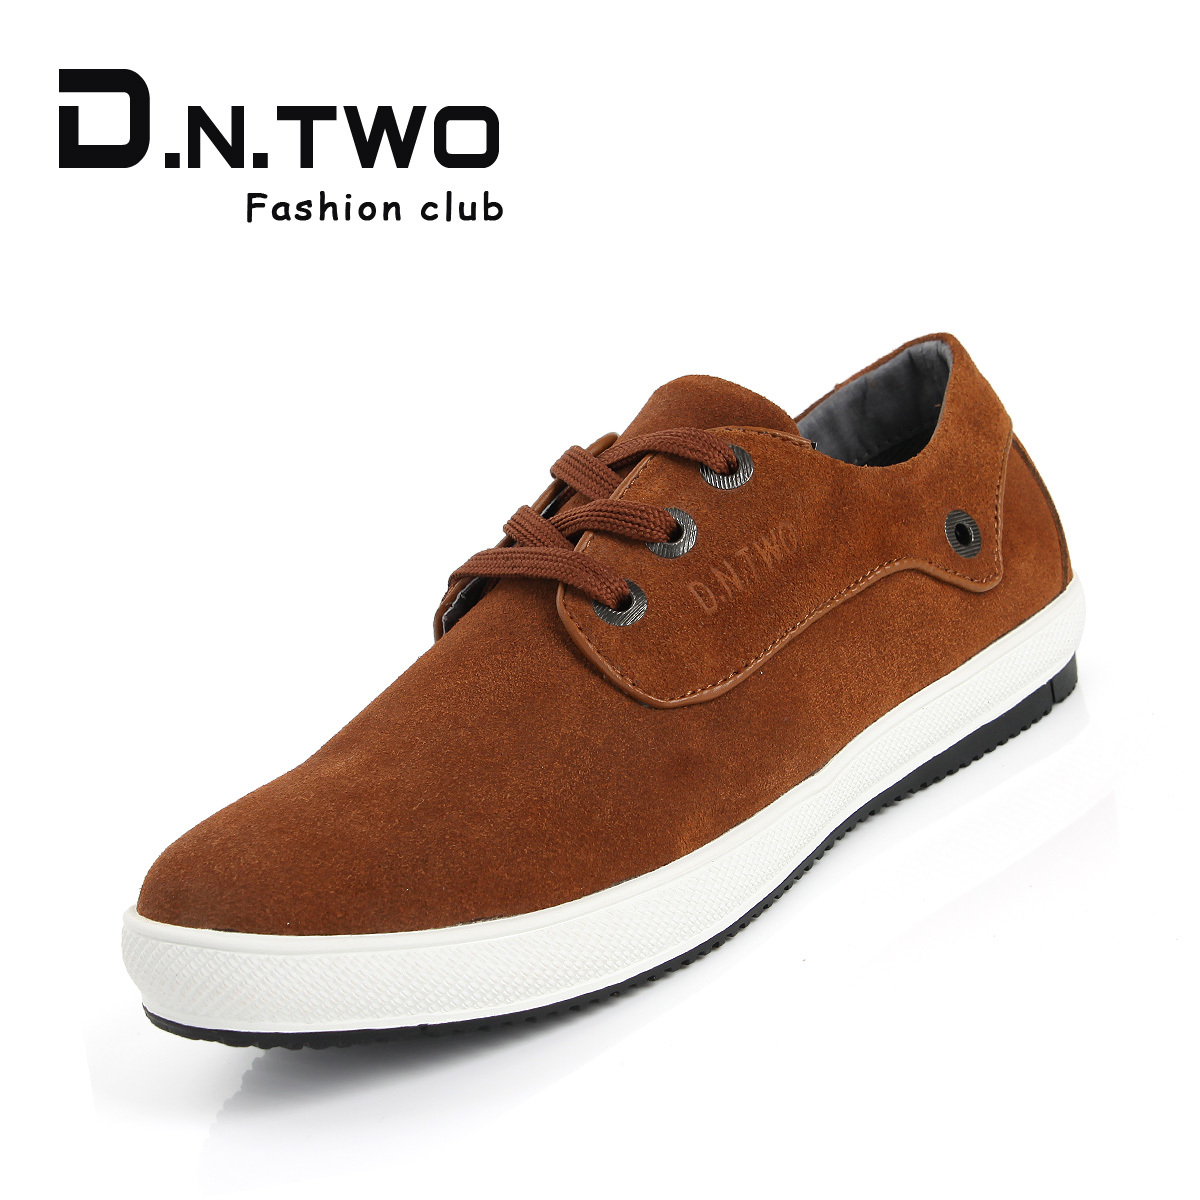 Демисезонные ботинки D. n. two d1009/2213 D.N.TWO 2213 Обувь на тонкой подошве ( для скейтборда ) Корейский Круглый носок Шнурок Весна и осень